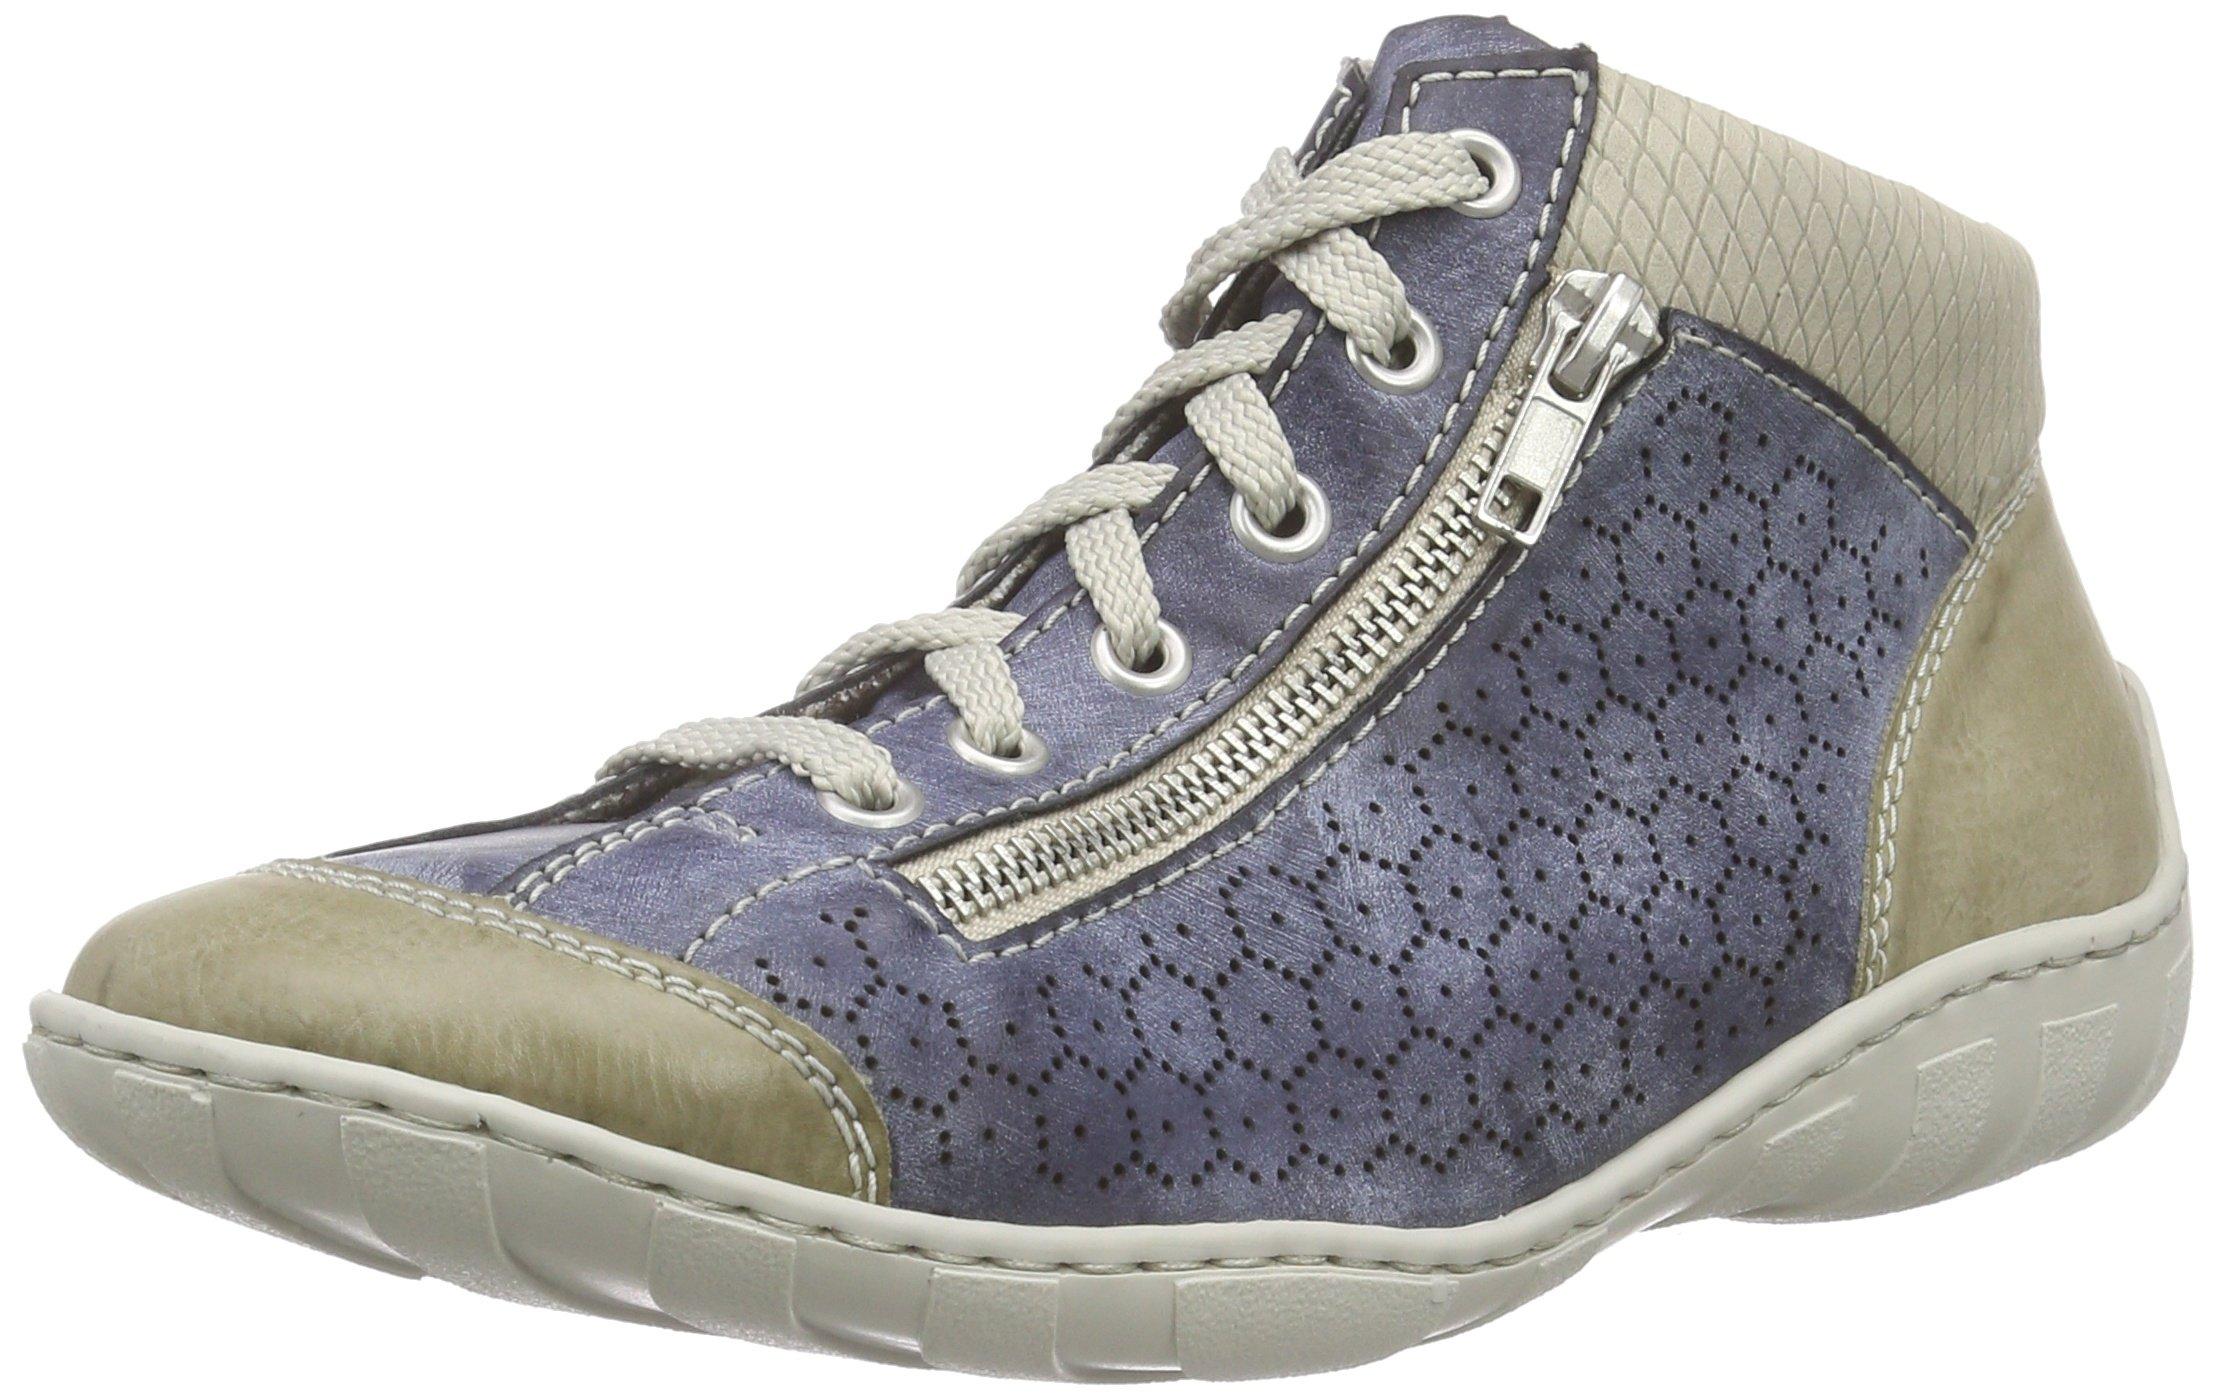 Rieker champignon6038 Blaumarble topSneakers Women Hi M3735 jeans Basses FemmeBleu kPuOZiX